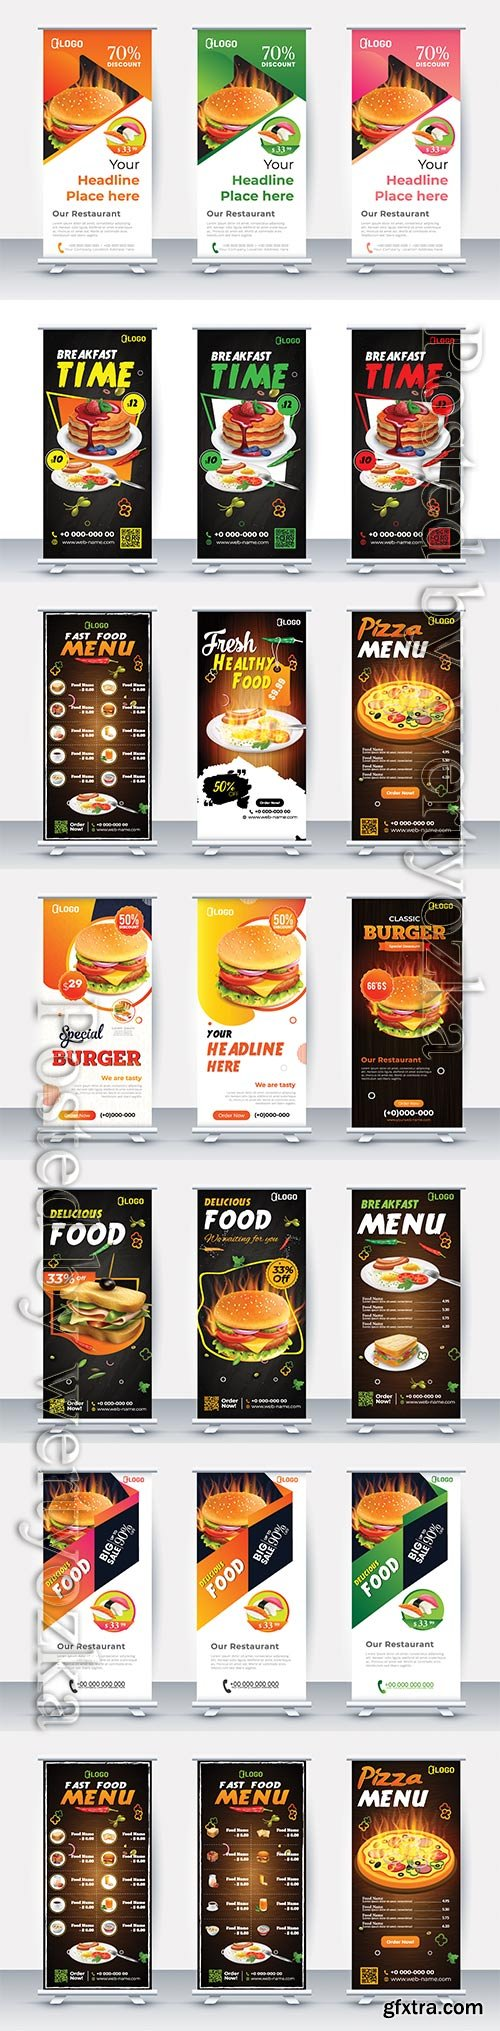 Fast food roll up banner restaurant menu template